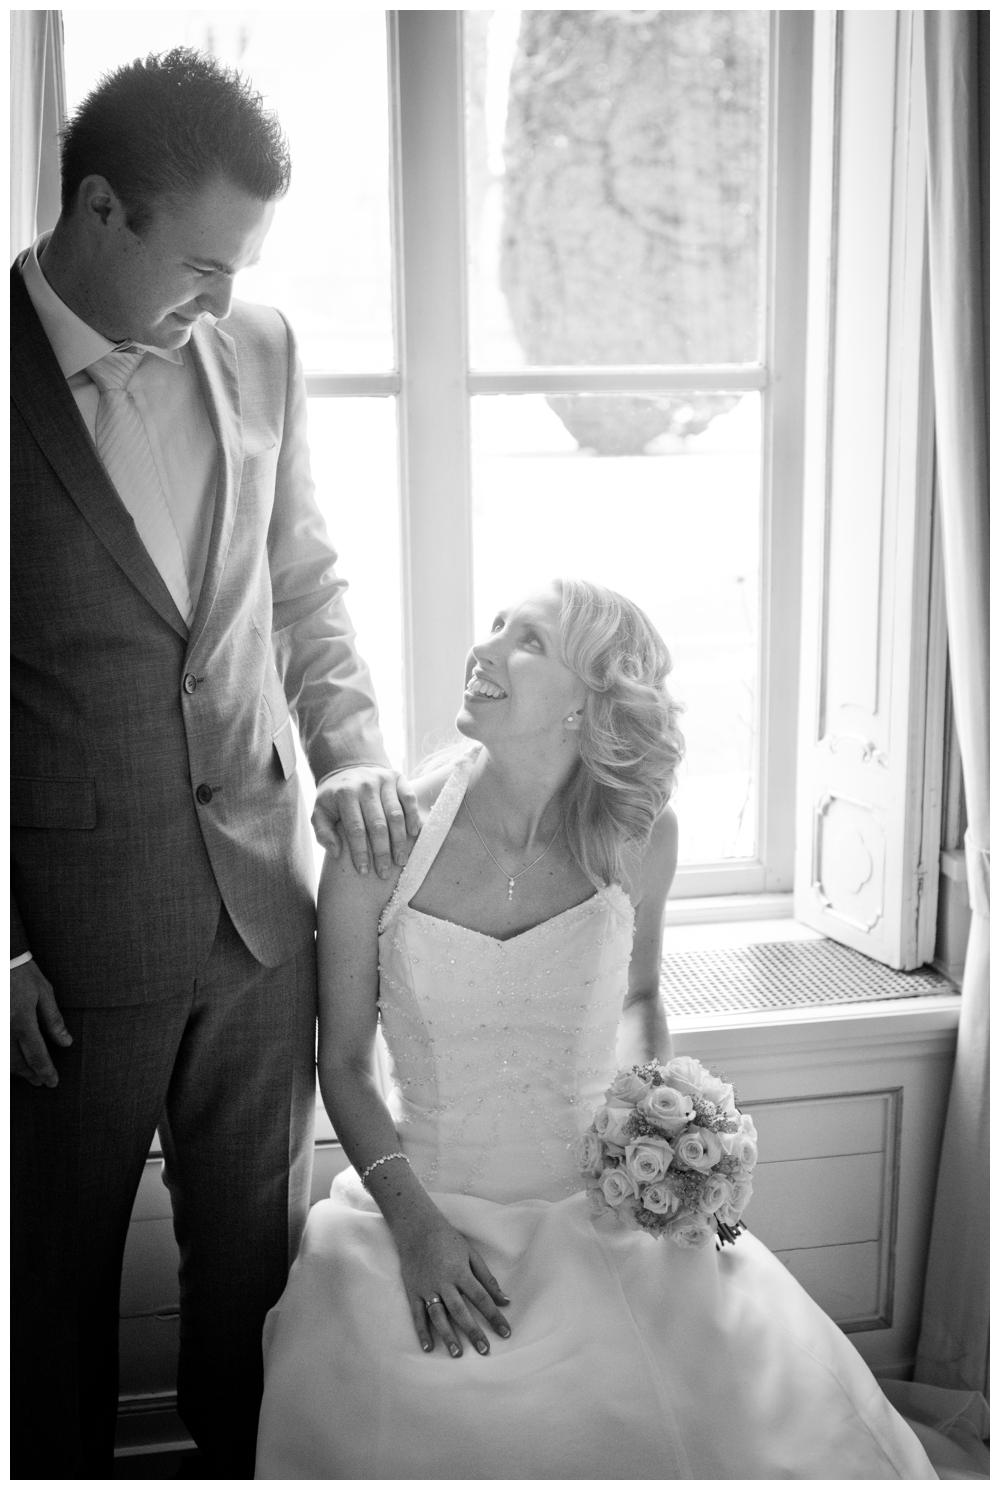 Wedding Robbert&Marlon ZW093.jpg